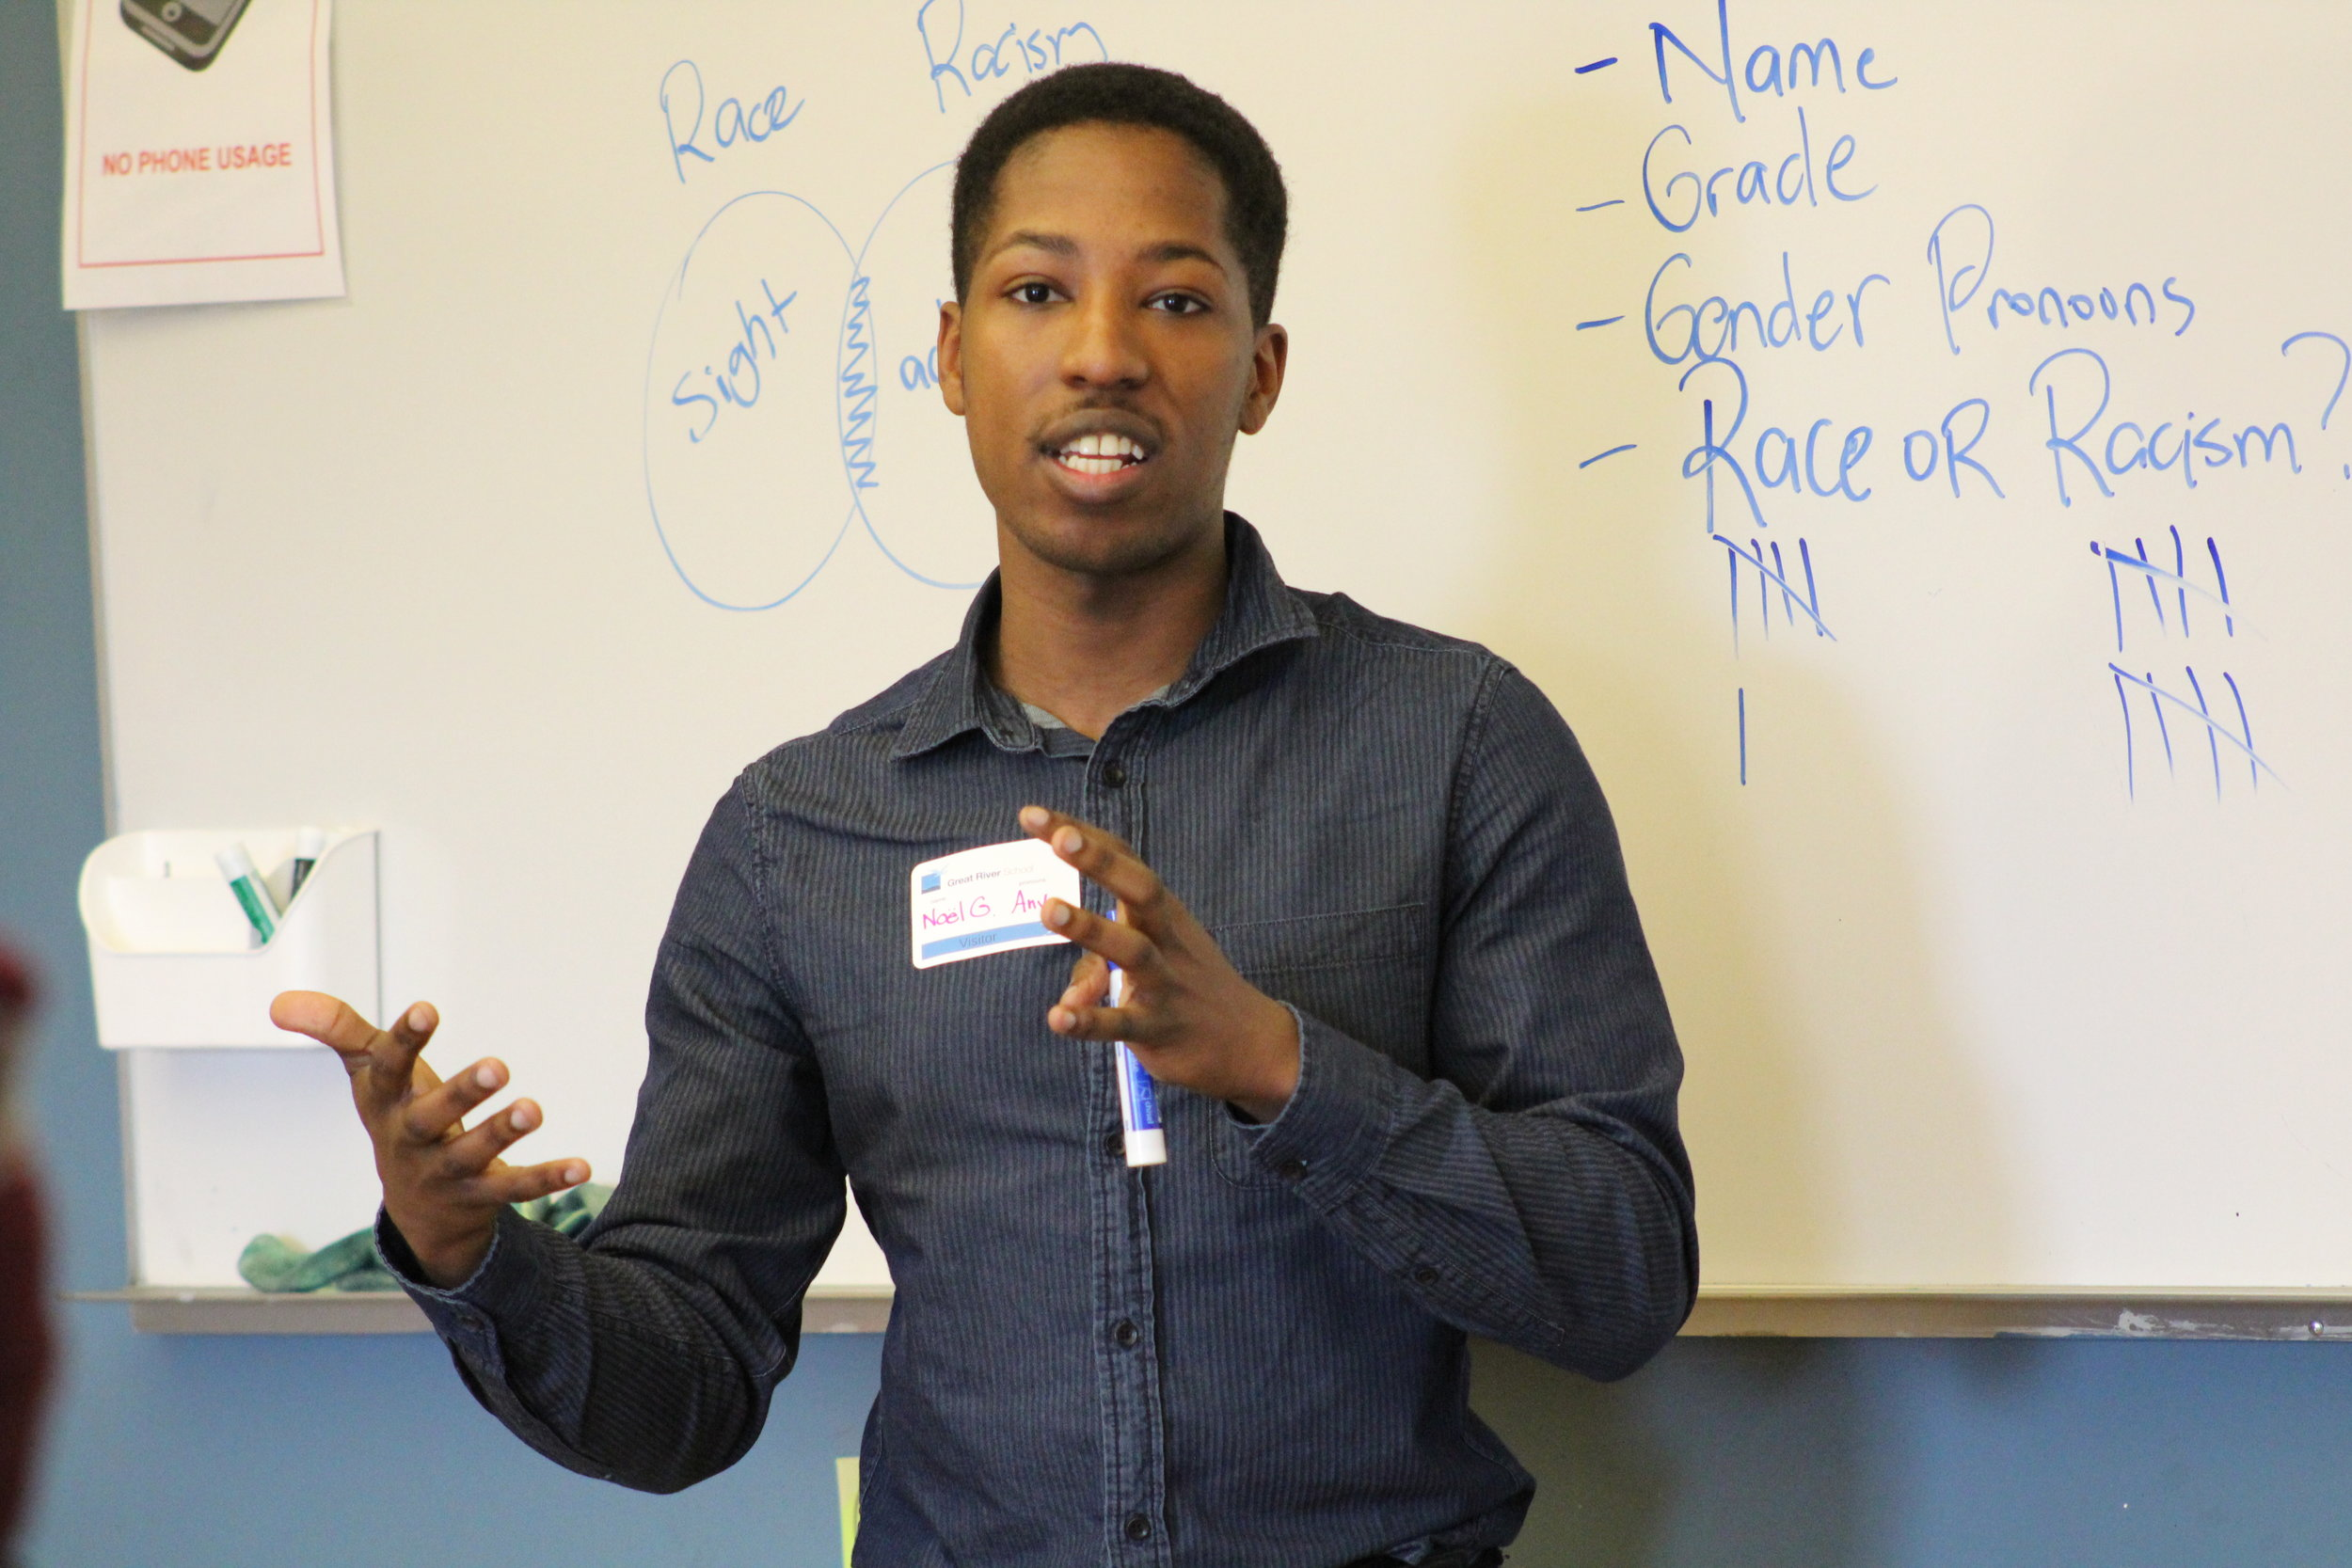 Workshop facilitator Noel Gordon speaks to a room of GRS students